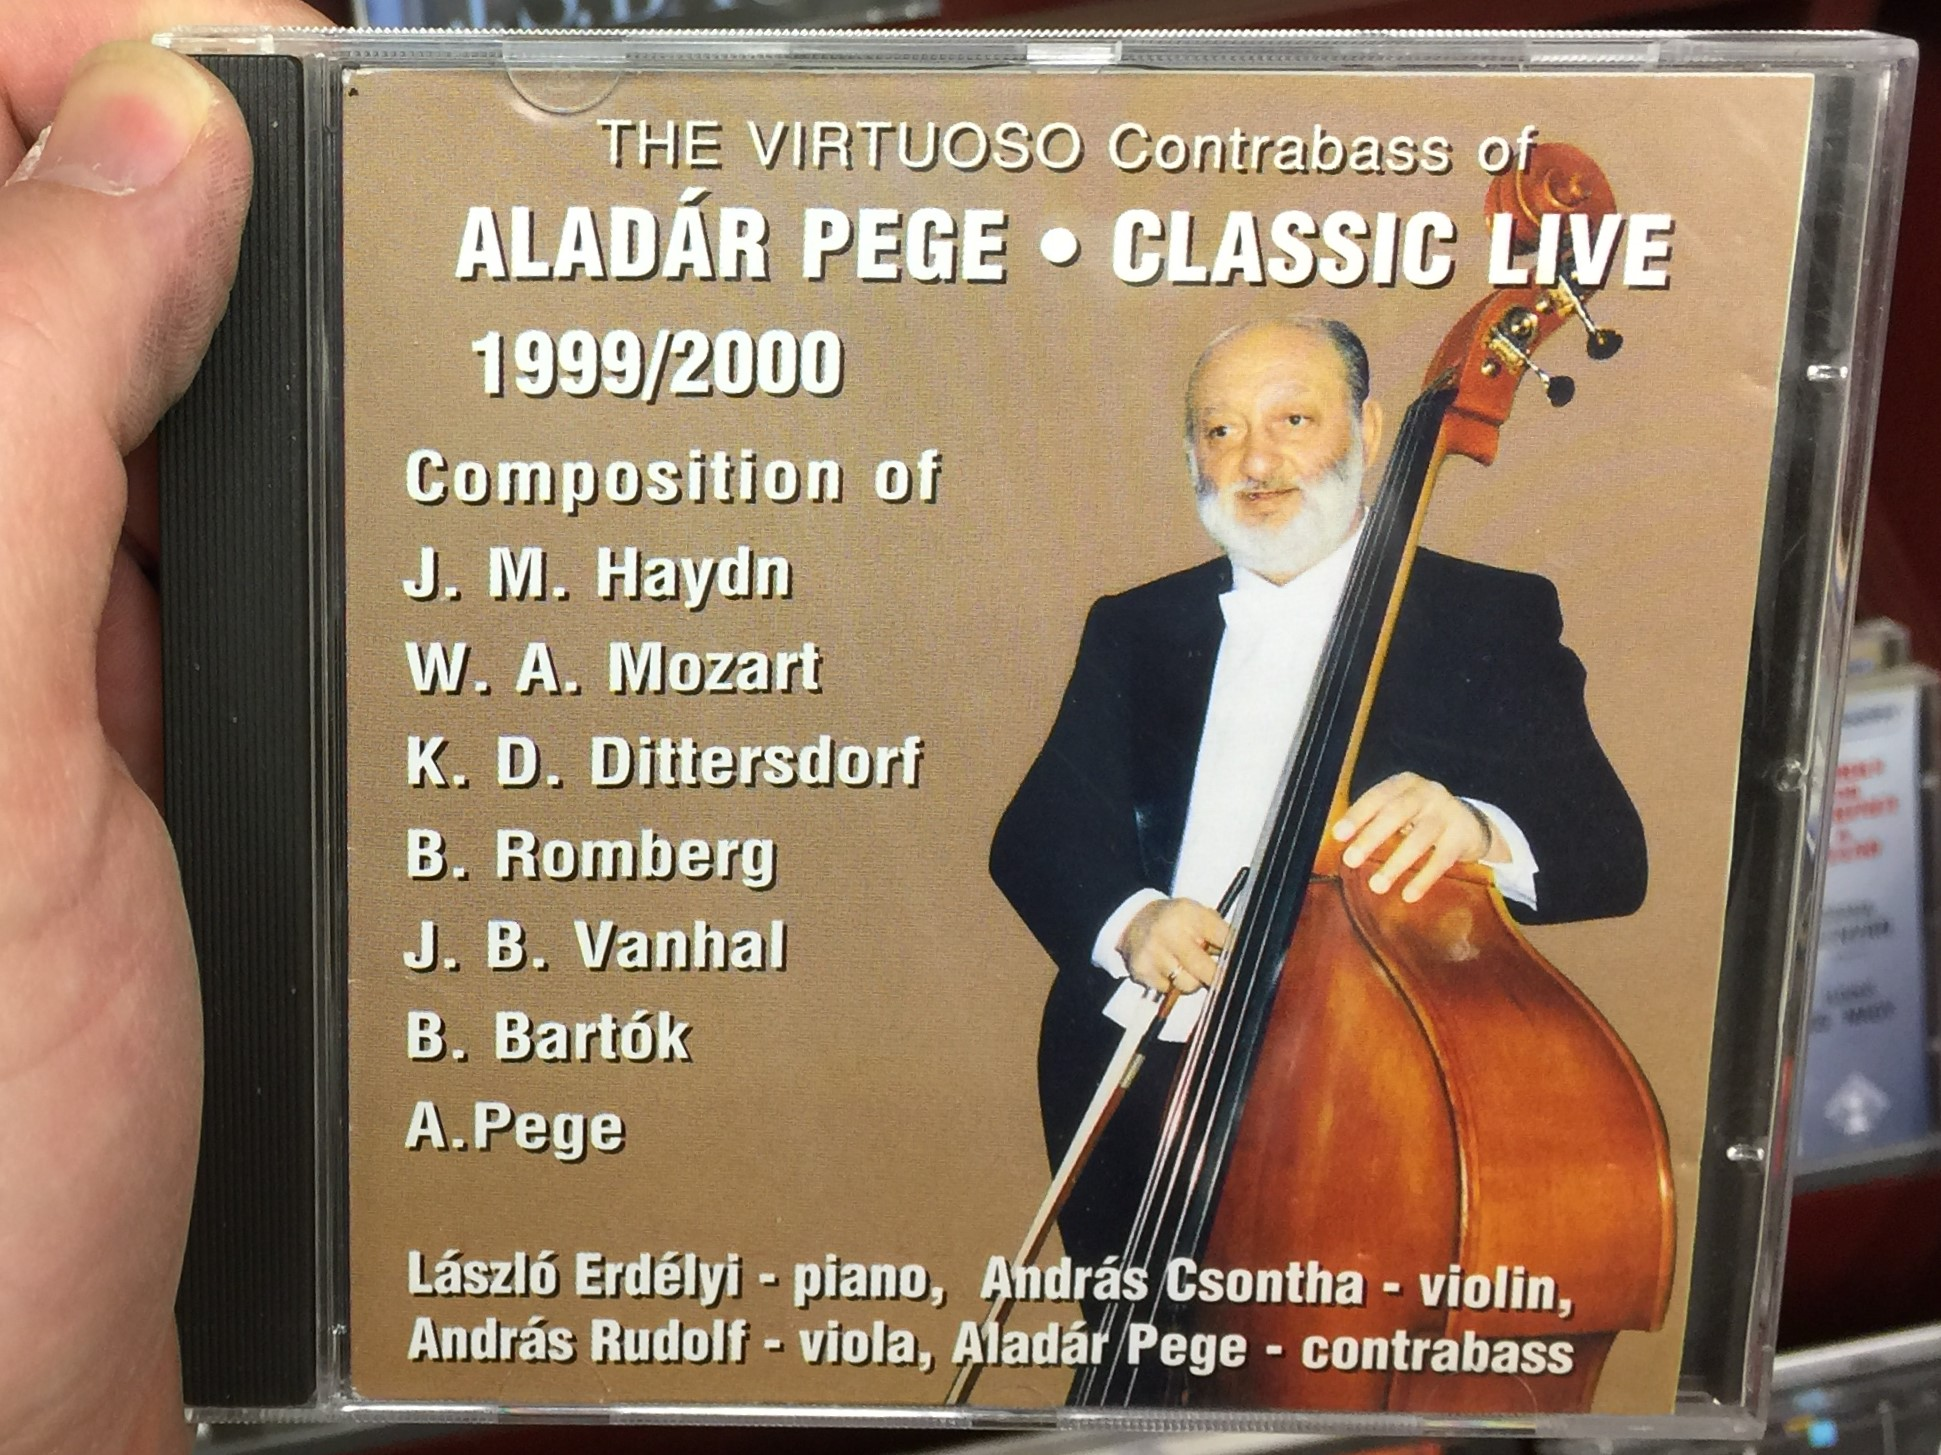 the-virtuoso-contrabass-of-aladar-pege-classic-live-19992000-composition-of-j.-m.-haydn-w.-a.-mozart-laszlo-erdelyi-piano-andras-csontha-violin-andras-rudolf-viola-aladar-pege-cont-1-.jpg